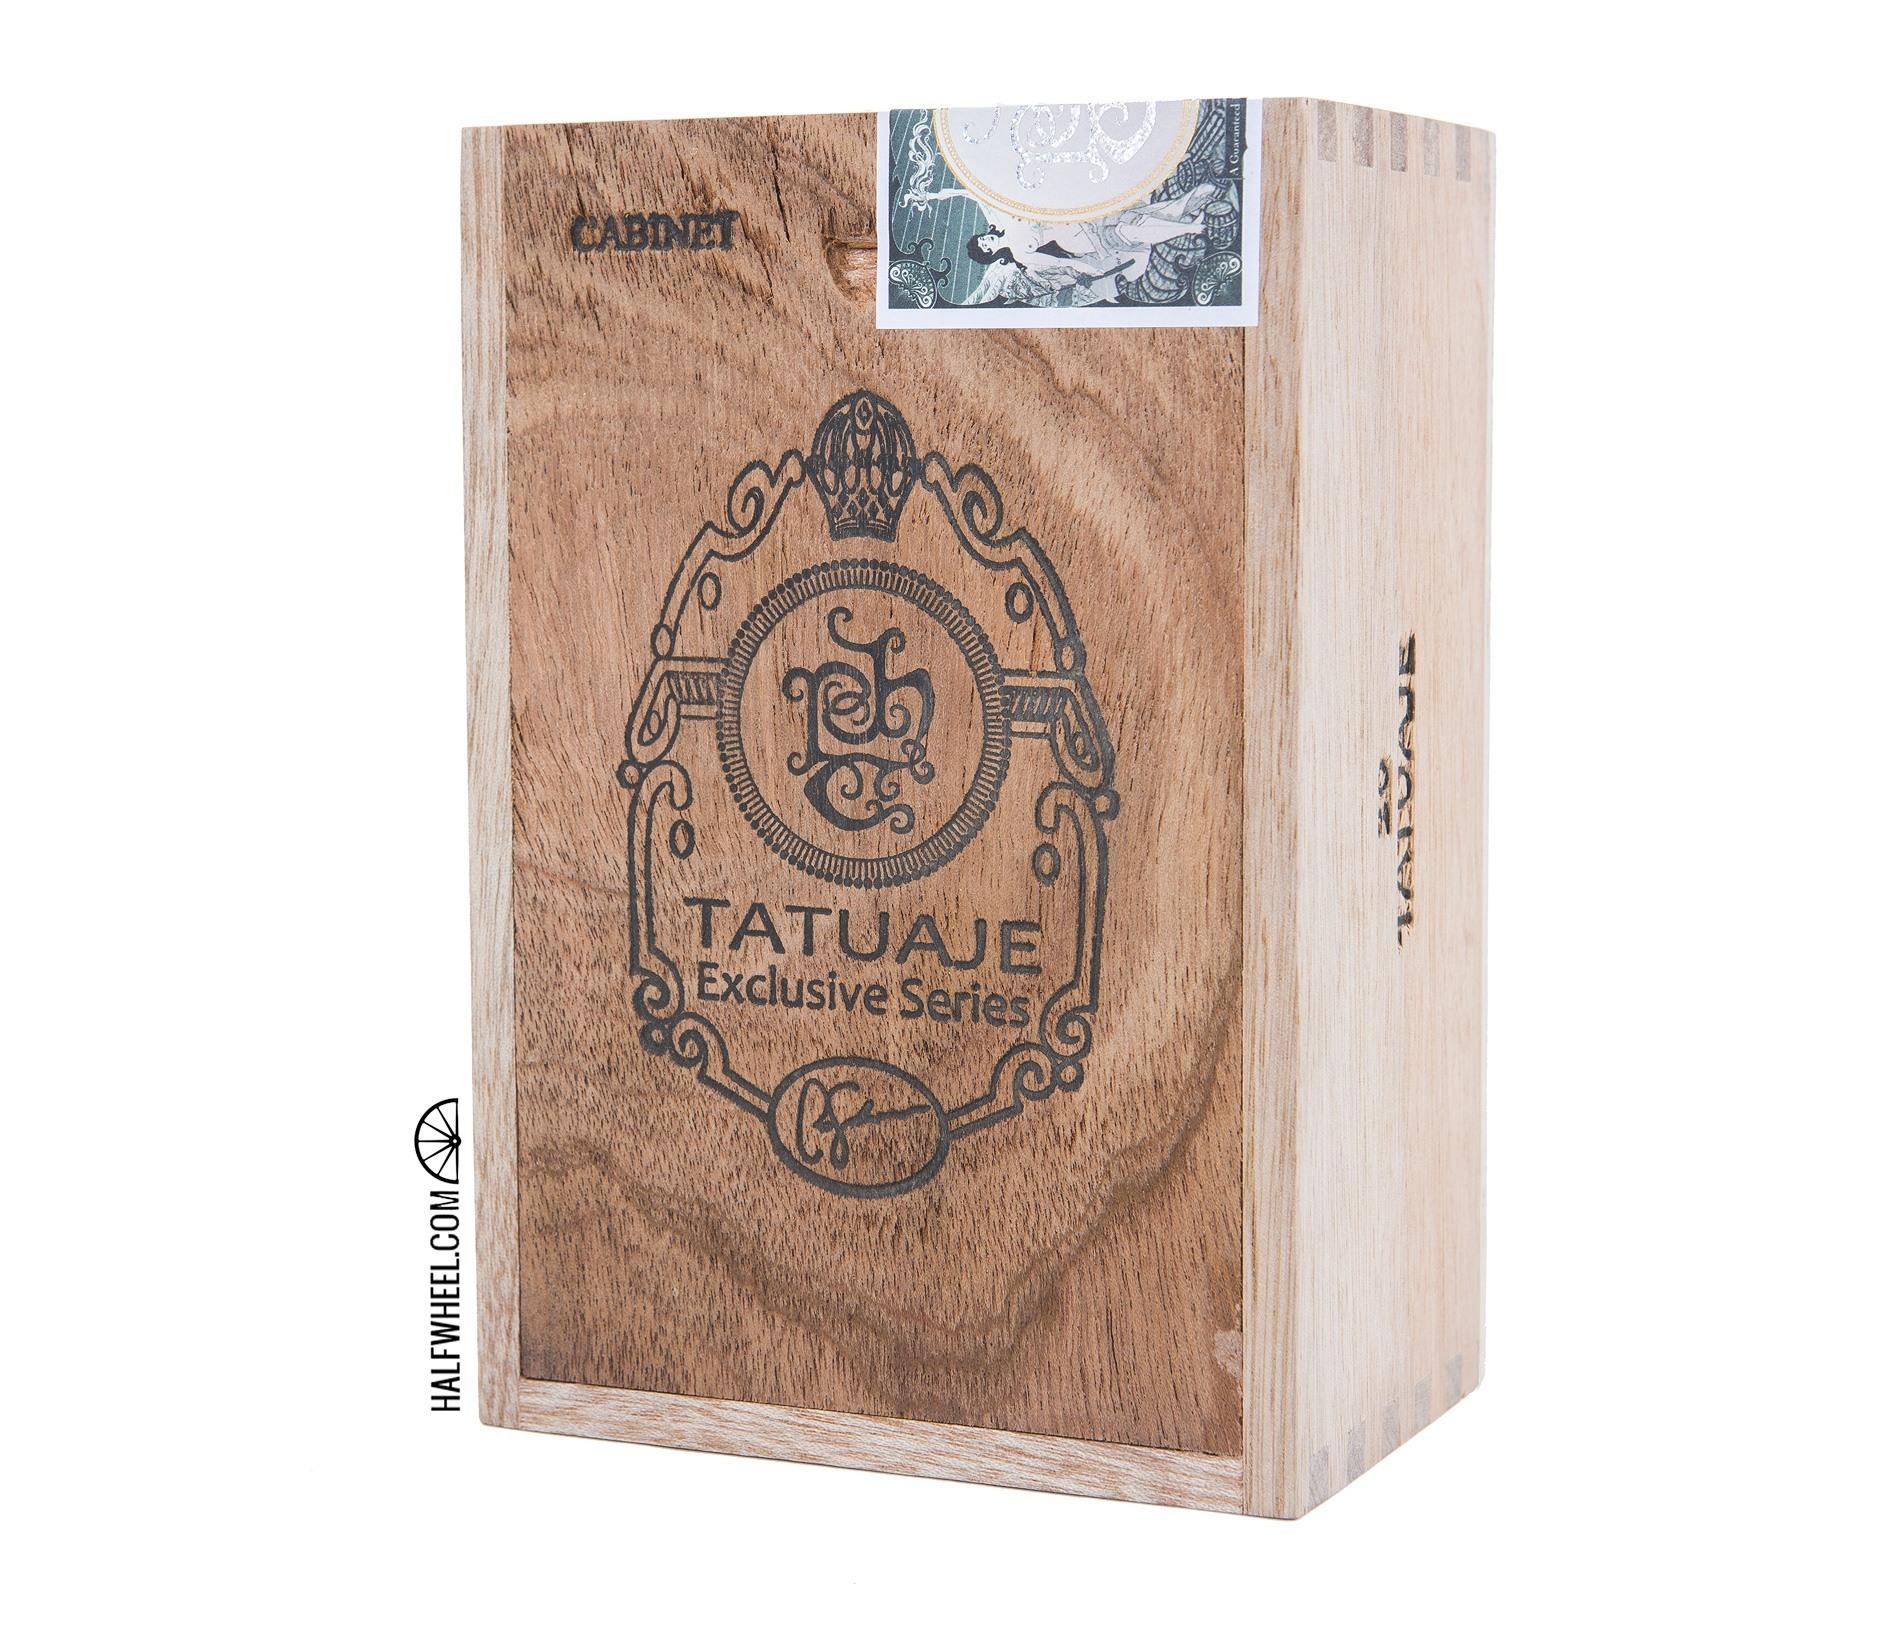 Tatuaje TAA 2014 Box 1